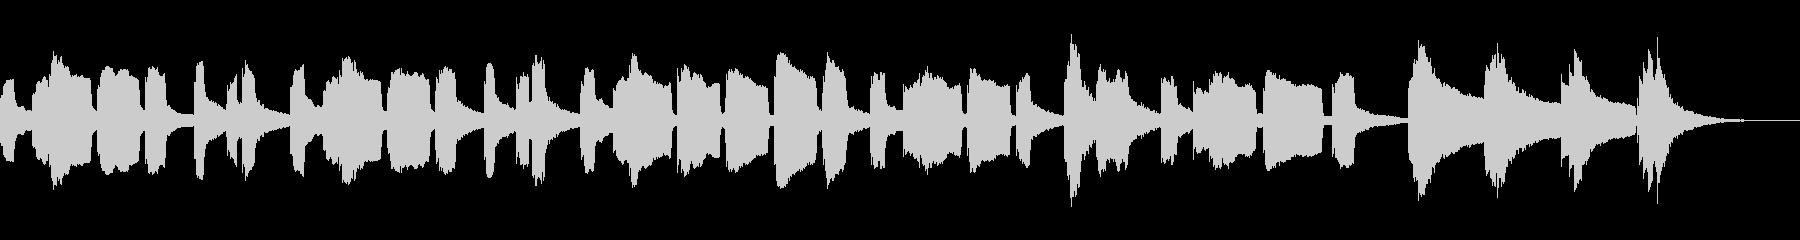 KANT可愛いハッピーバースデー2の未再生の波形